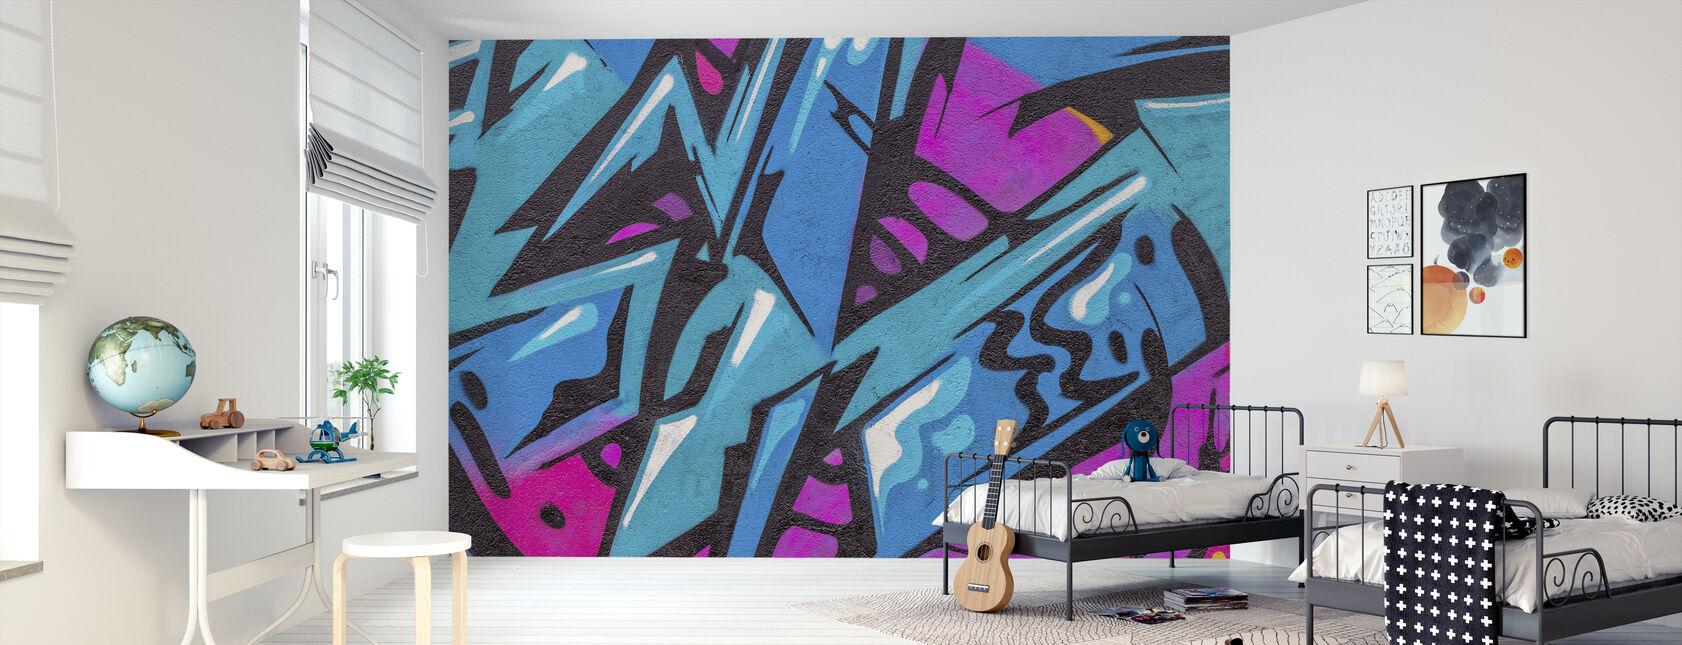 Mode farve graffiti - Tapet - Børneværelse